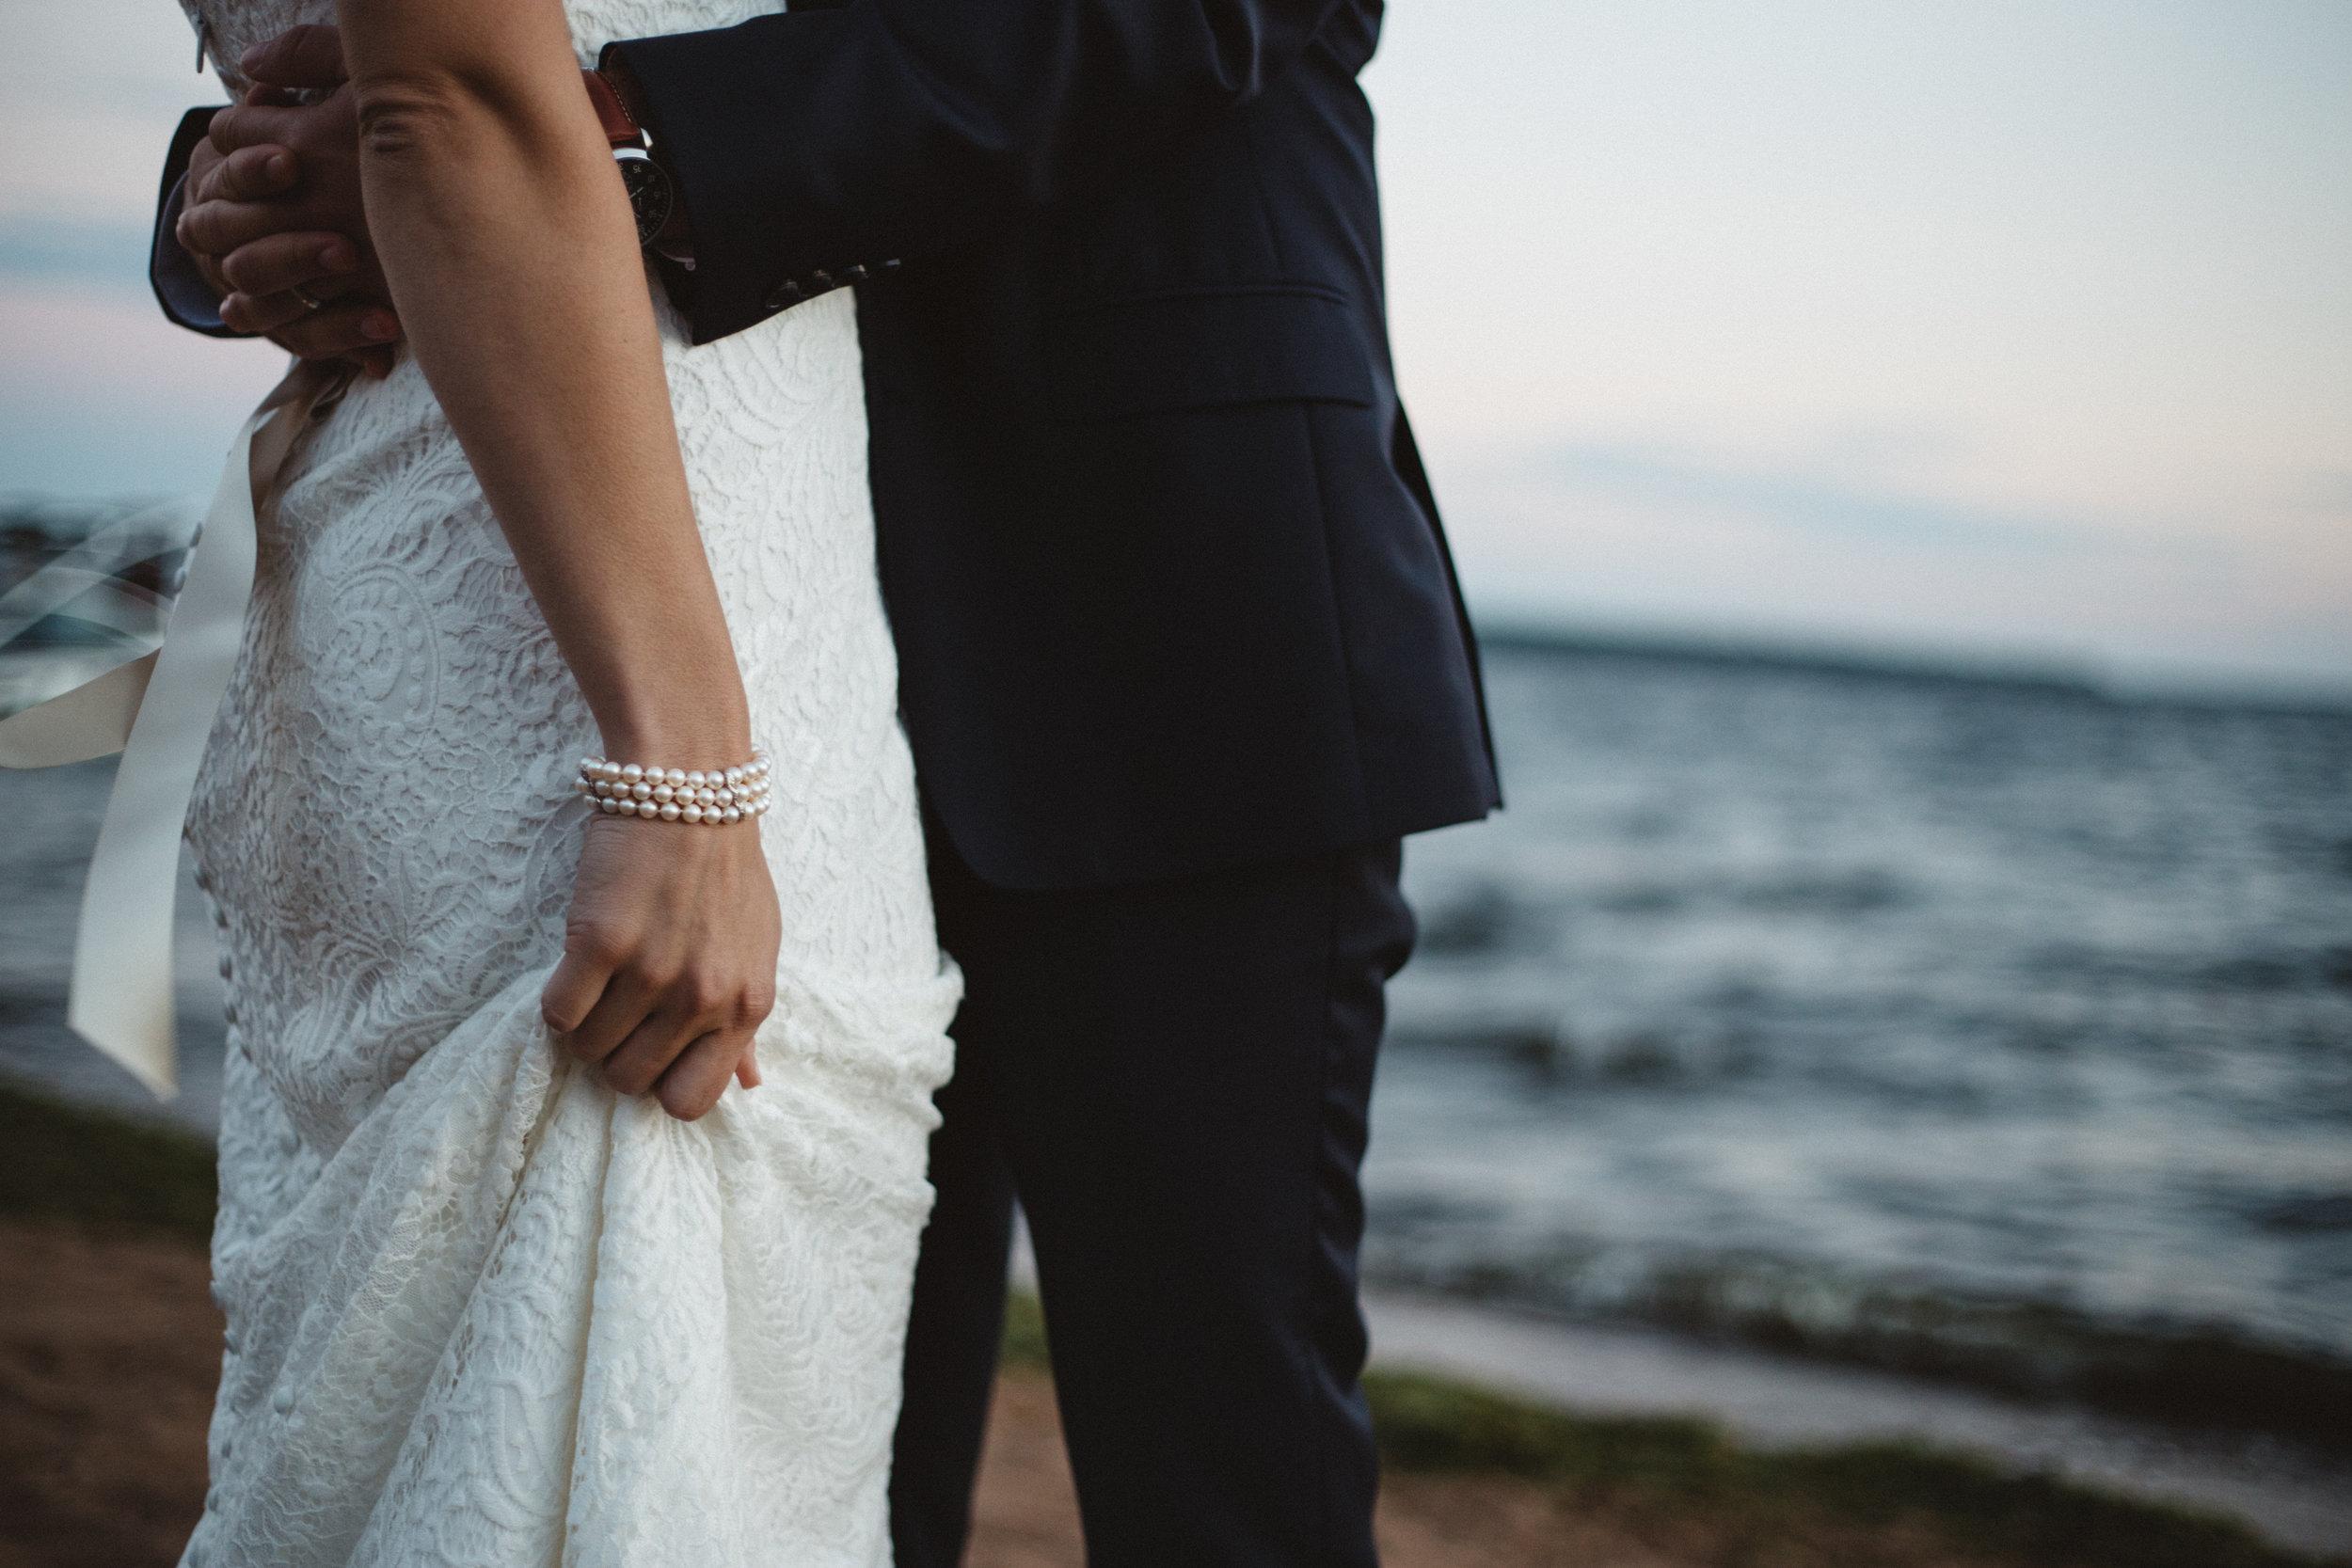 Meaningful wedding photography at Grand View Lodge by Britt DeZeeuw, Brainerd Minnesota elopement and destination photographer